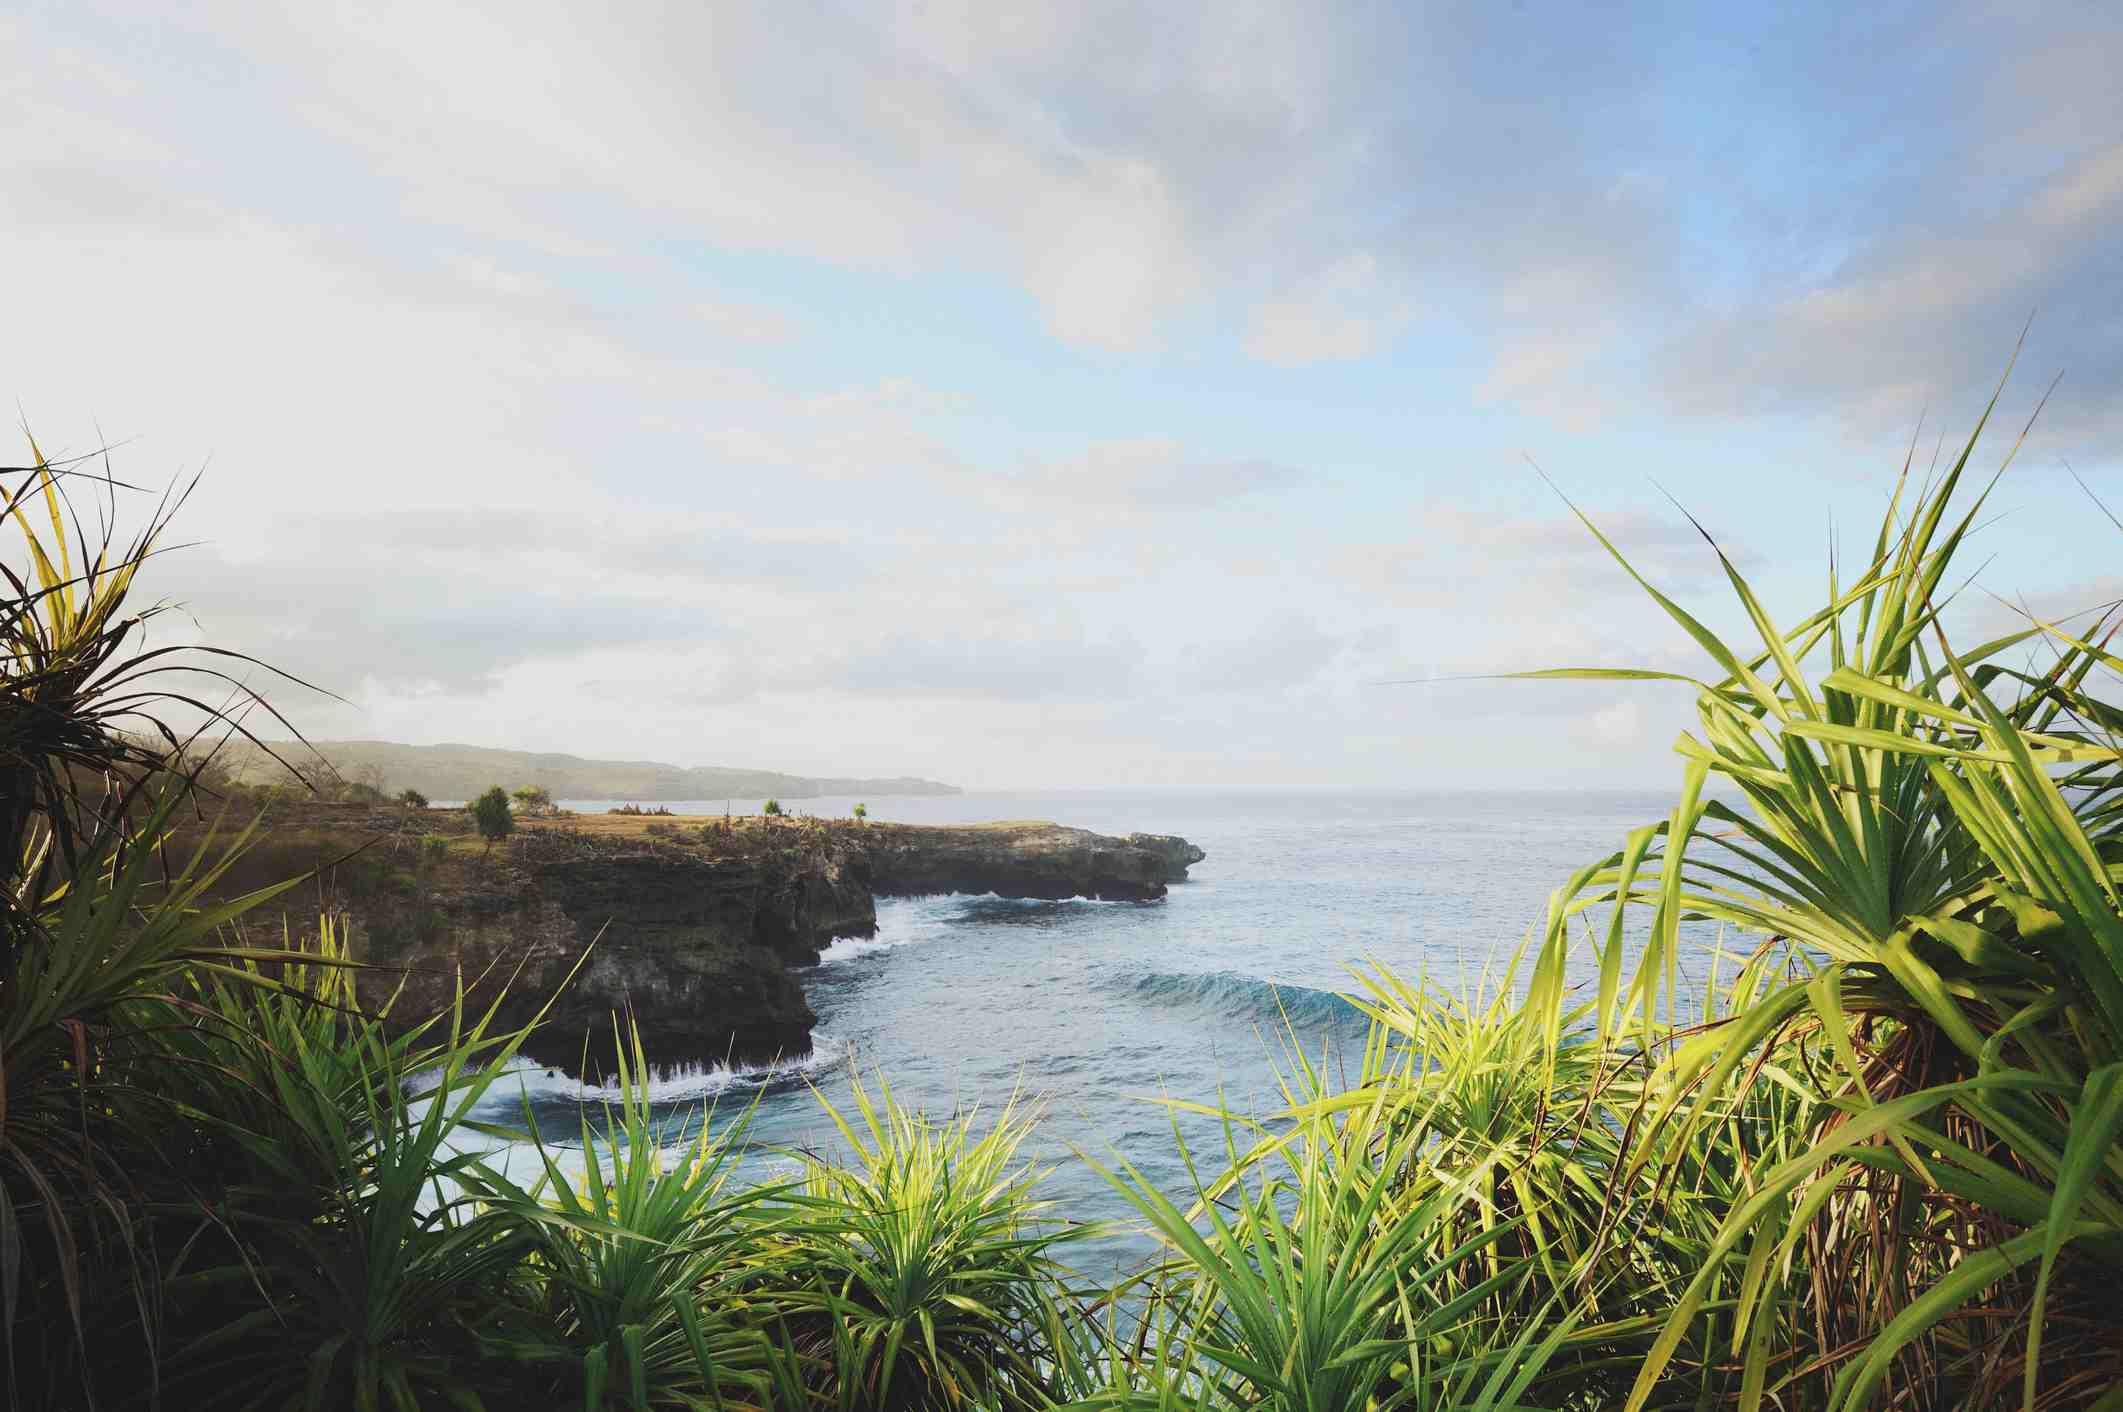 Nusa Ceningan morning landscape